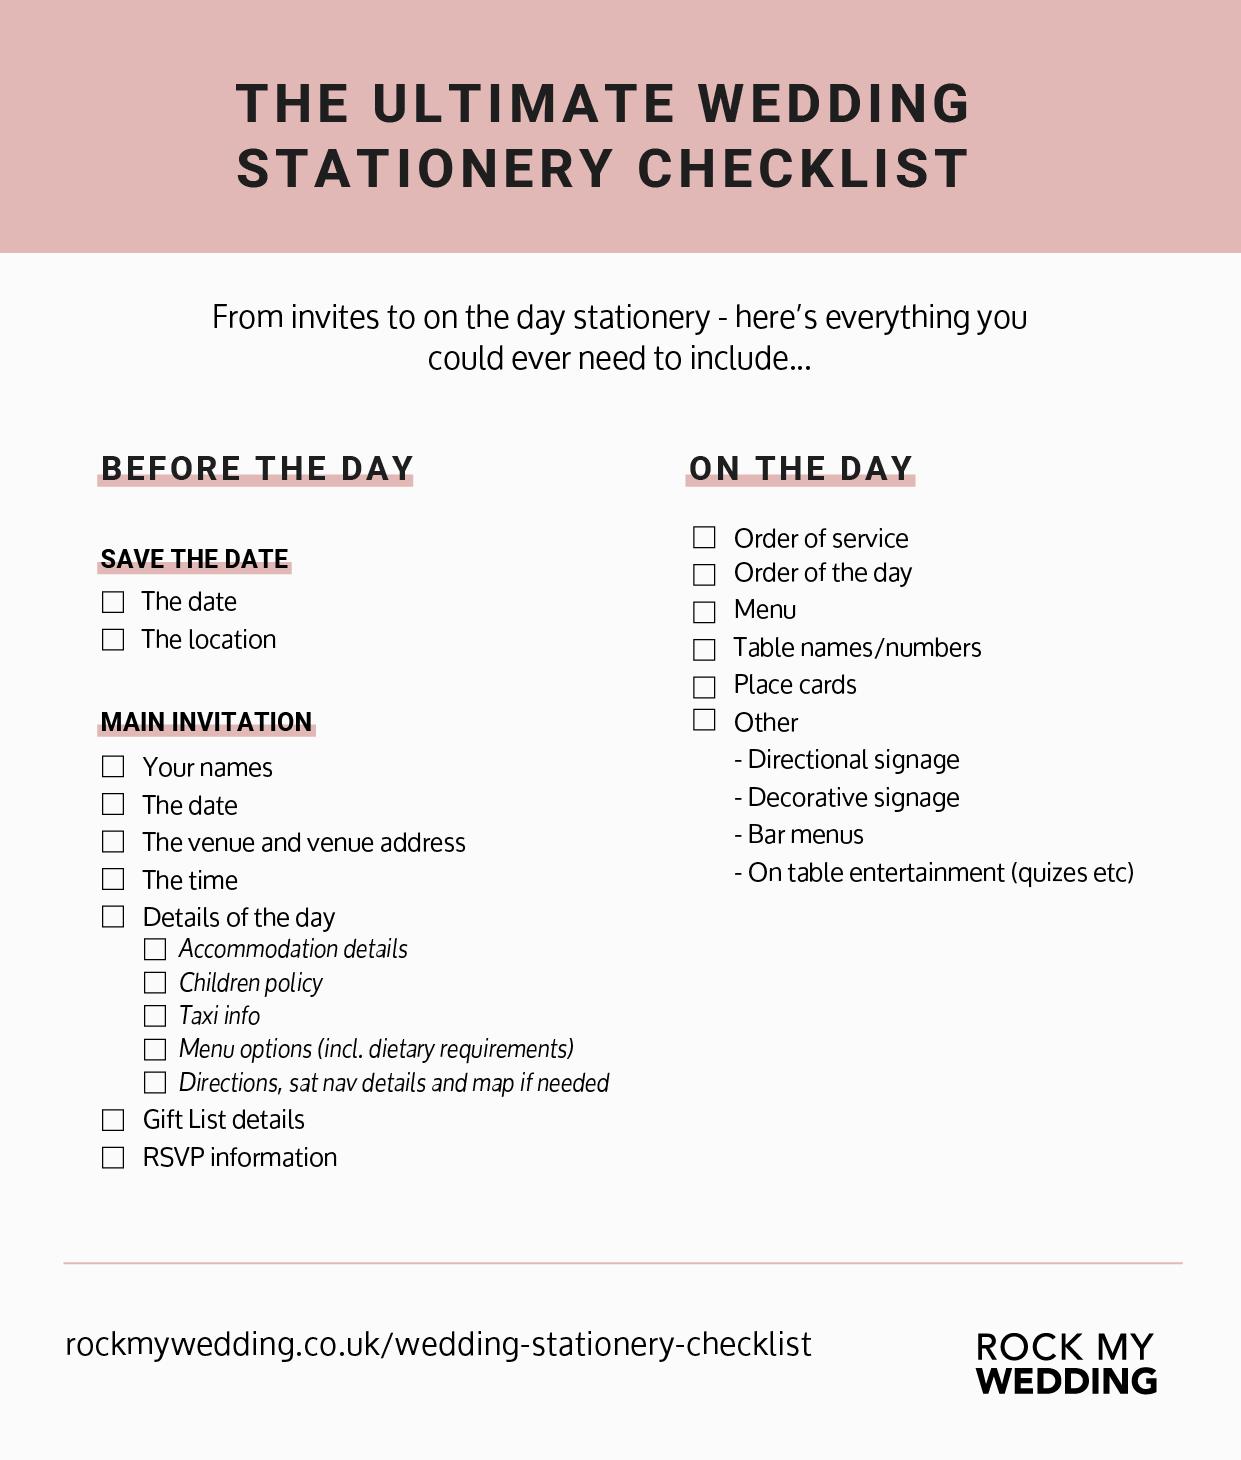 wedding stationery checklist 2021.png